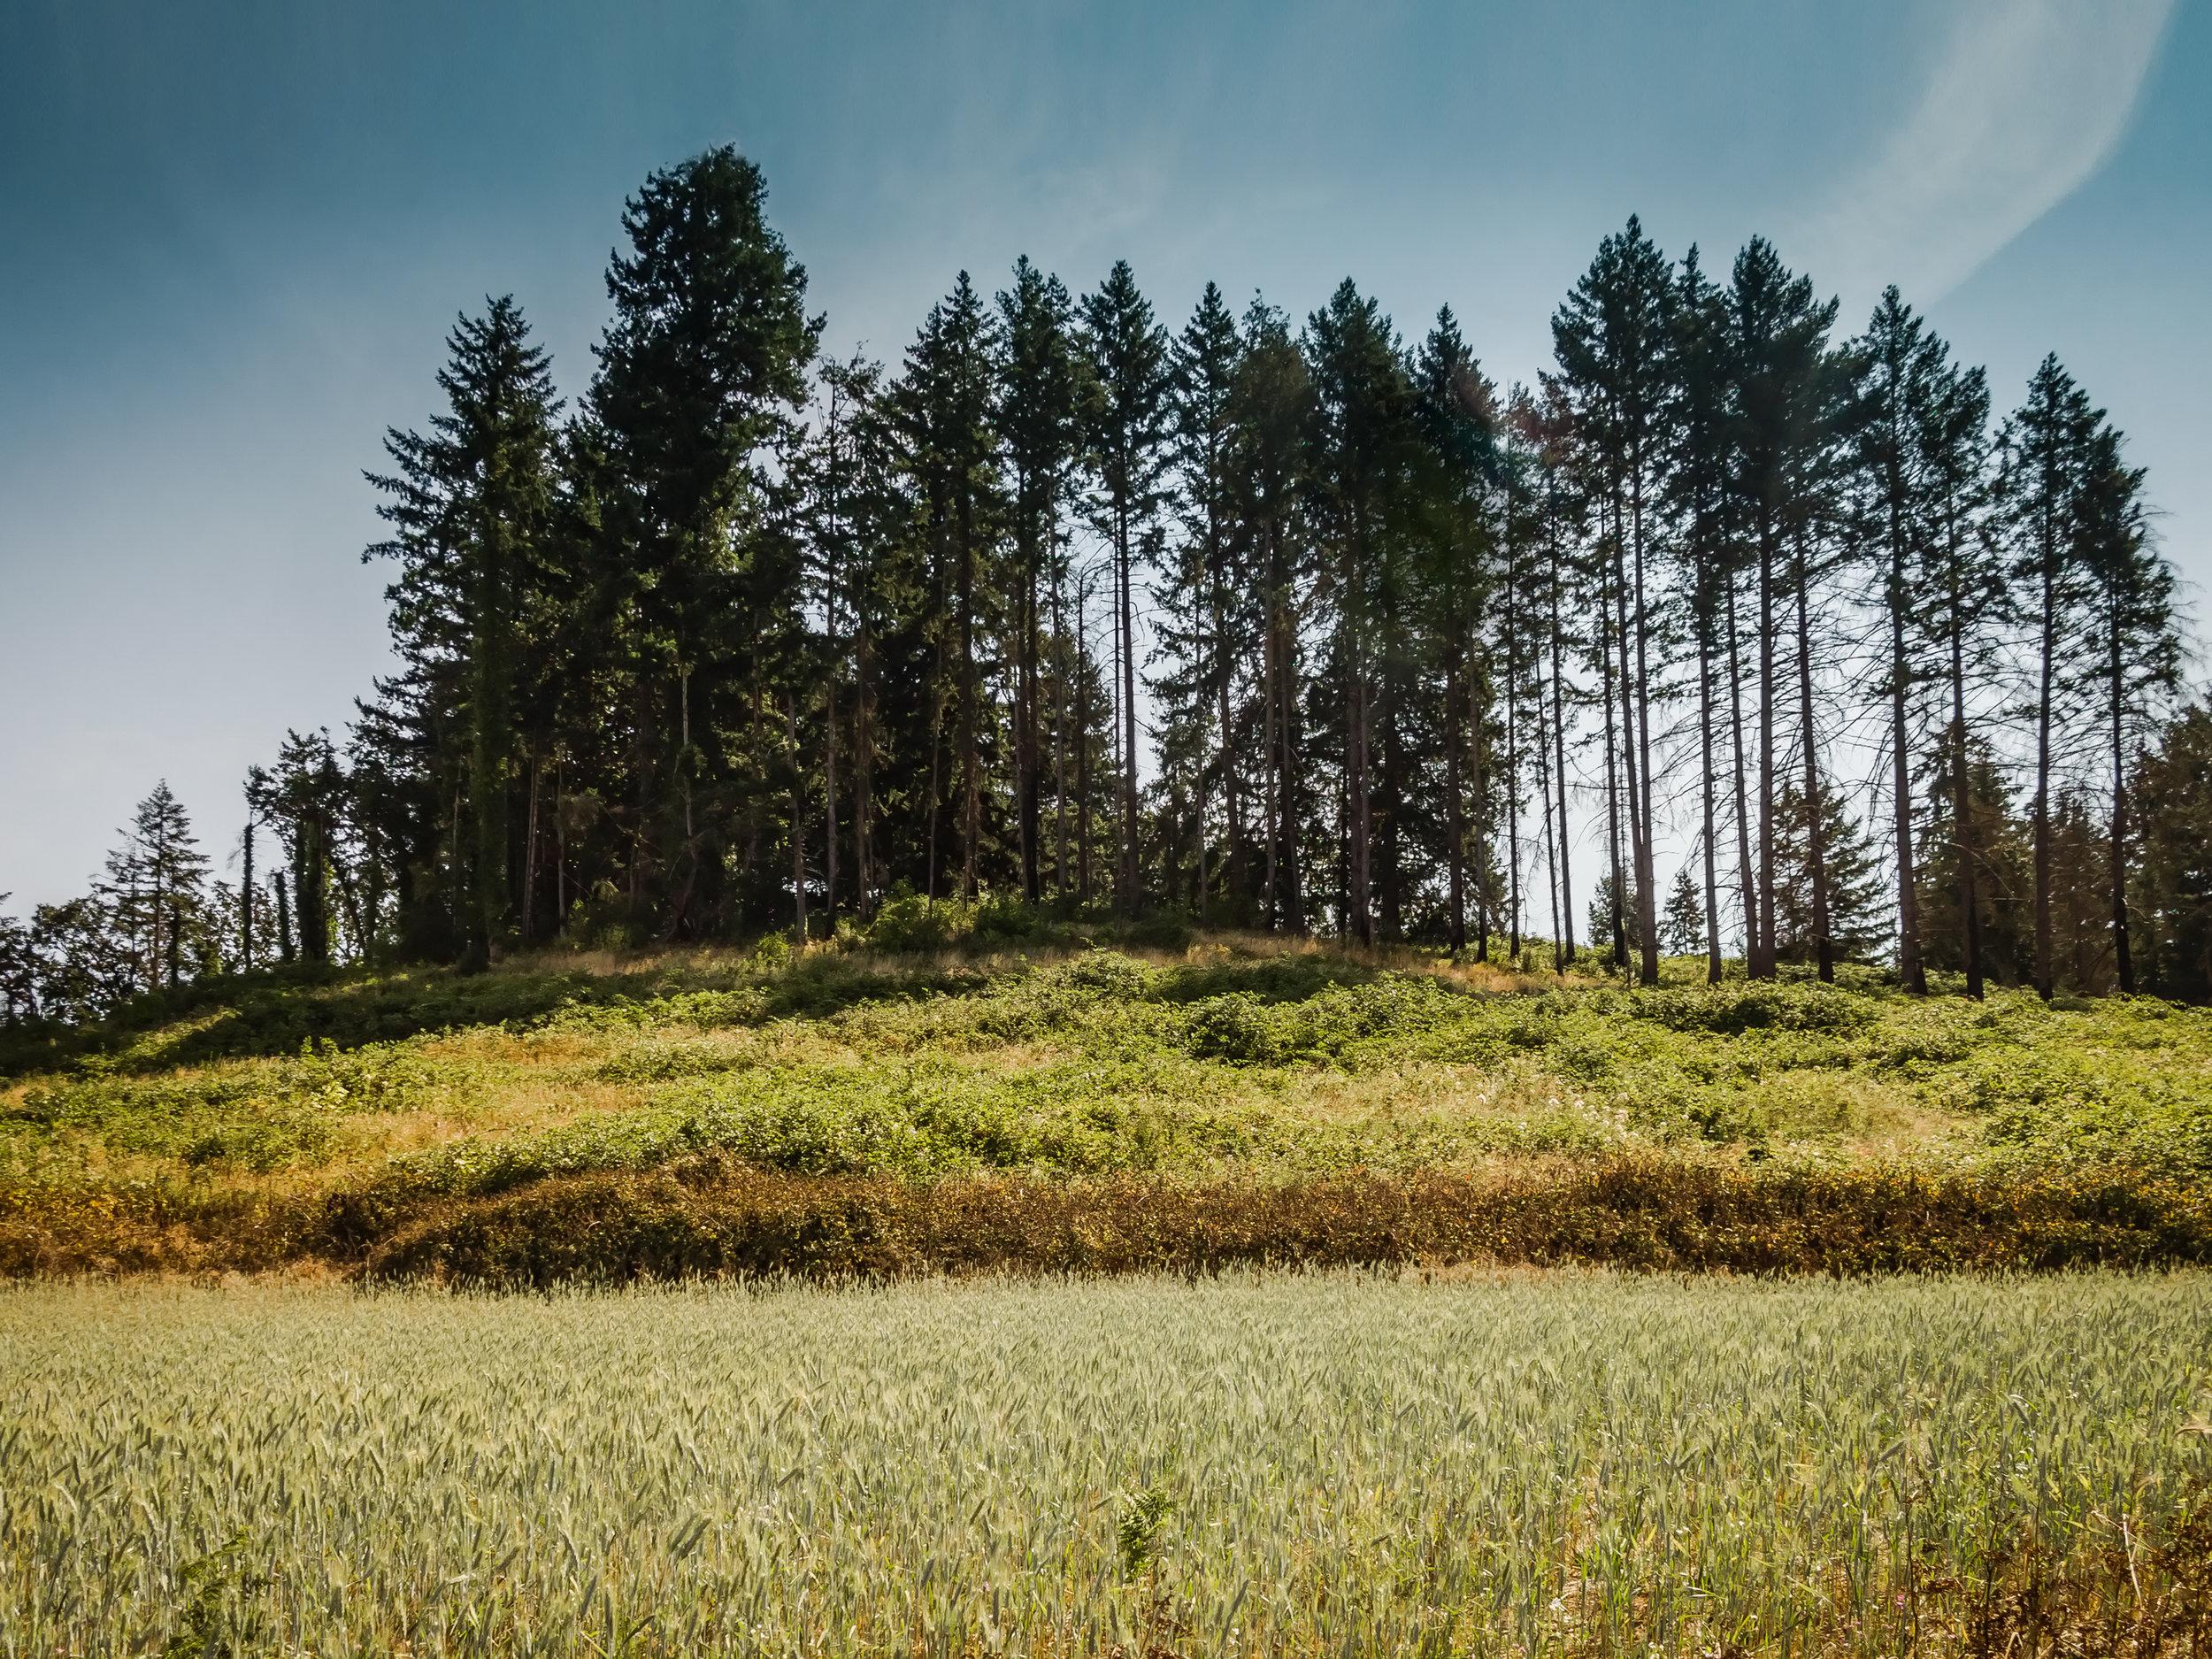 Oregon-2017-6956-2.jpg